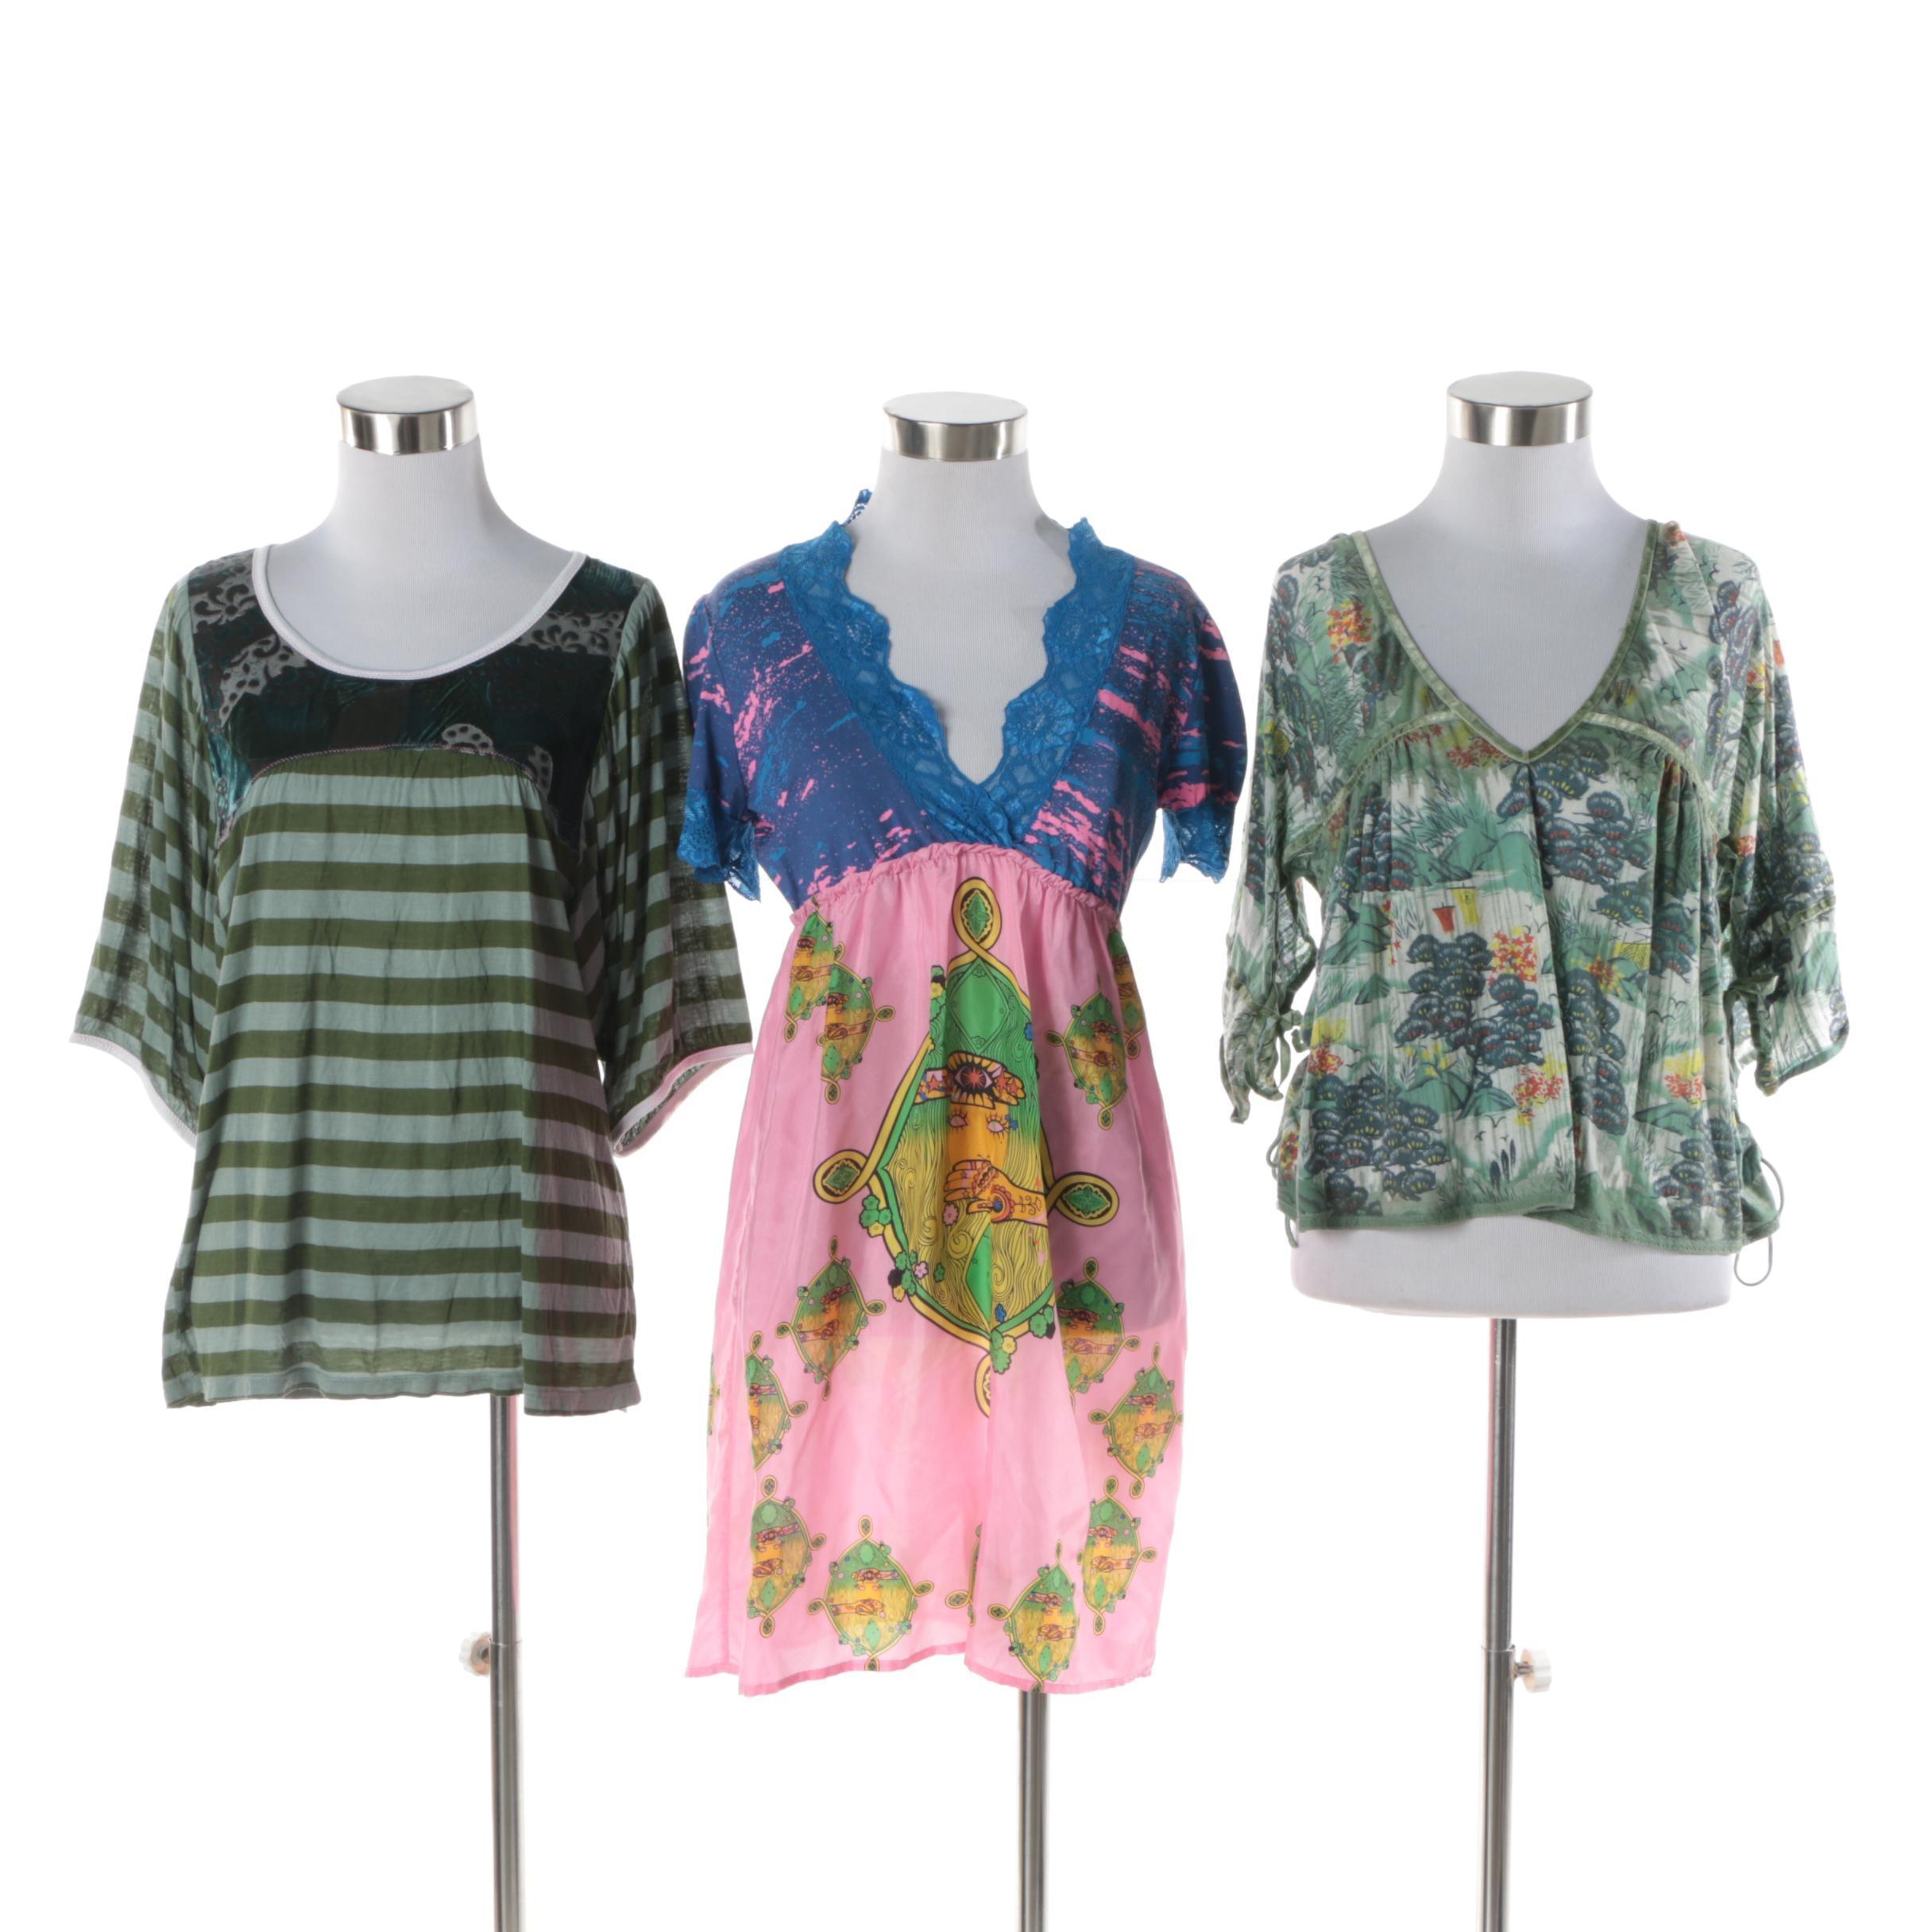 Women's Custo Barcelona Tunic and Tops